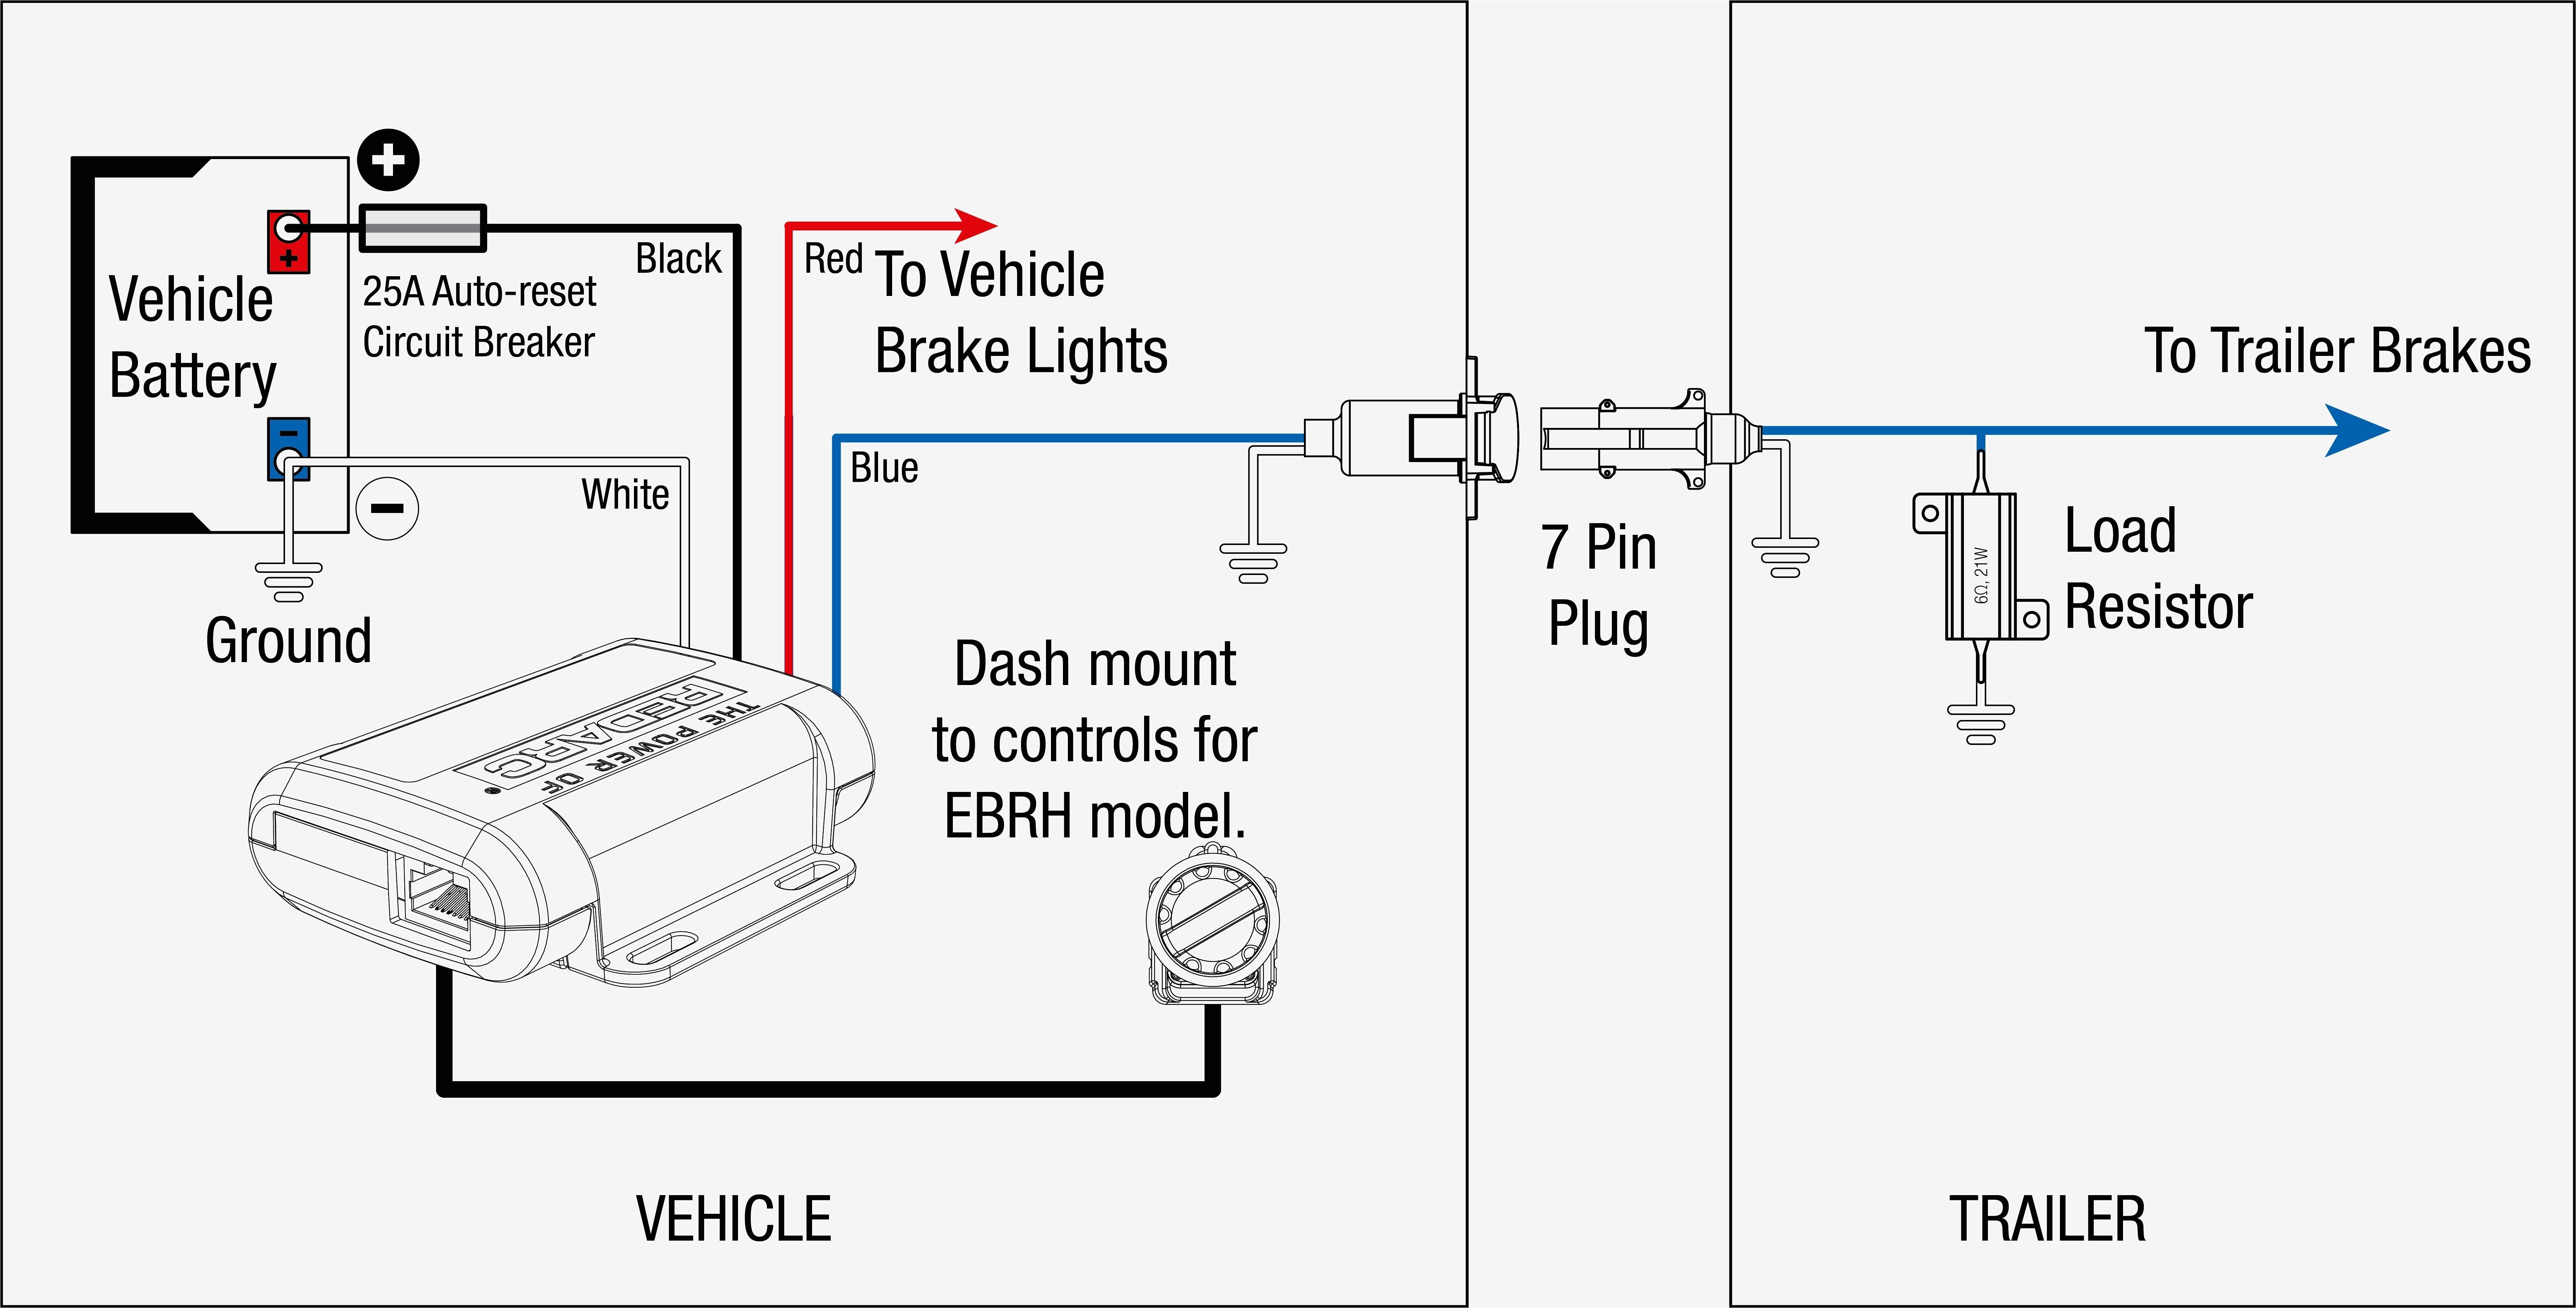 reese wiring diagram wiring diagrams konsult reese 7 pin wiring diagram hayman reese 7 pin wiring